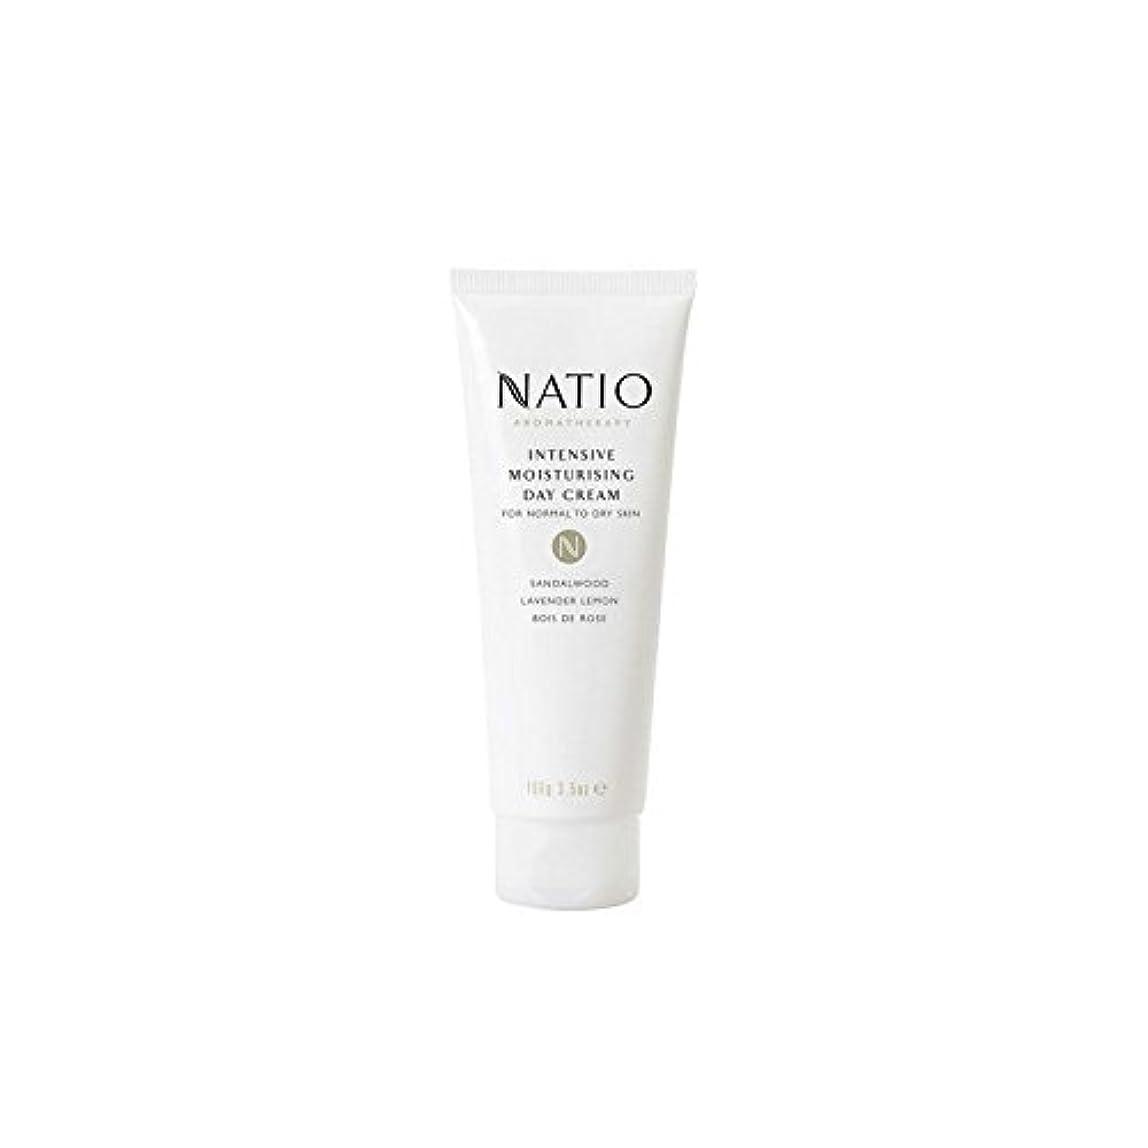 Natio Intensive Moisturising Day Cream (100G) (Pack of 6) - 集中的な保湿デイクリーム(100グラム) x6 [並行輸入品]